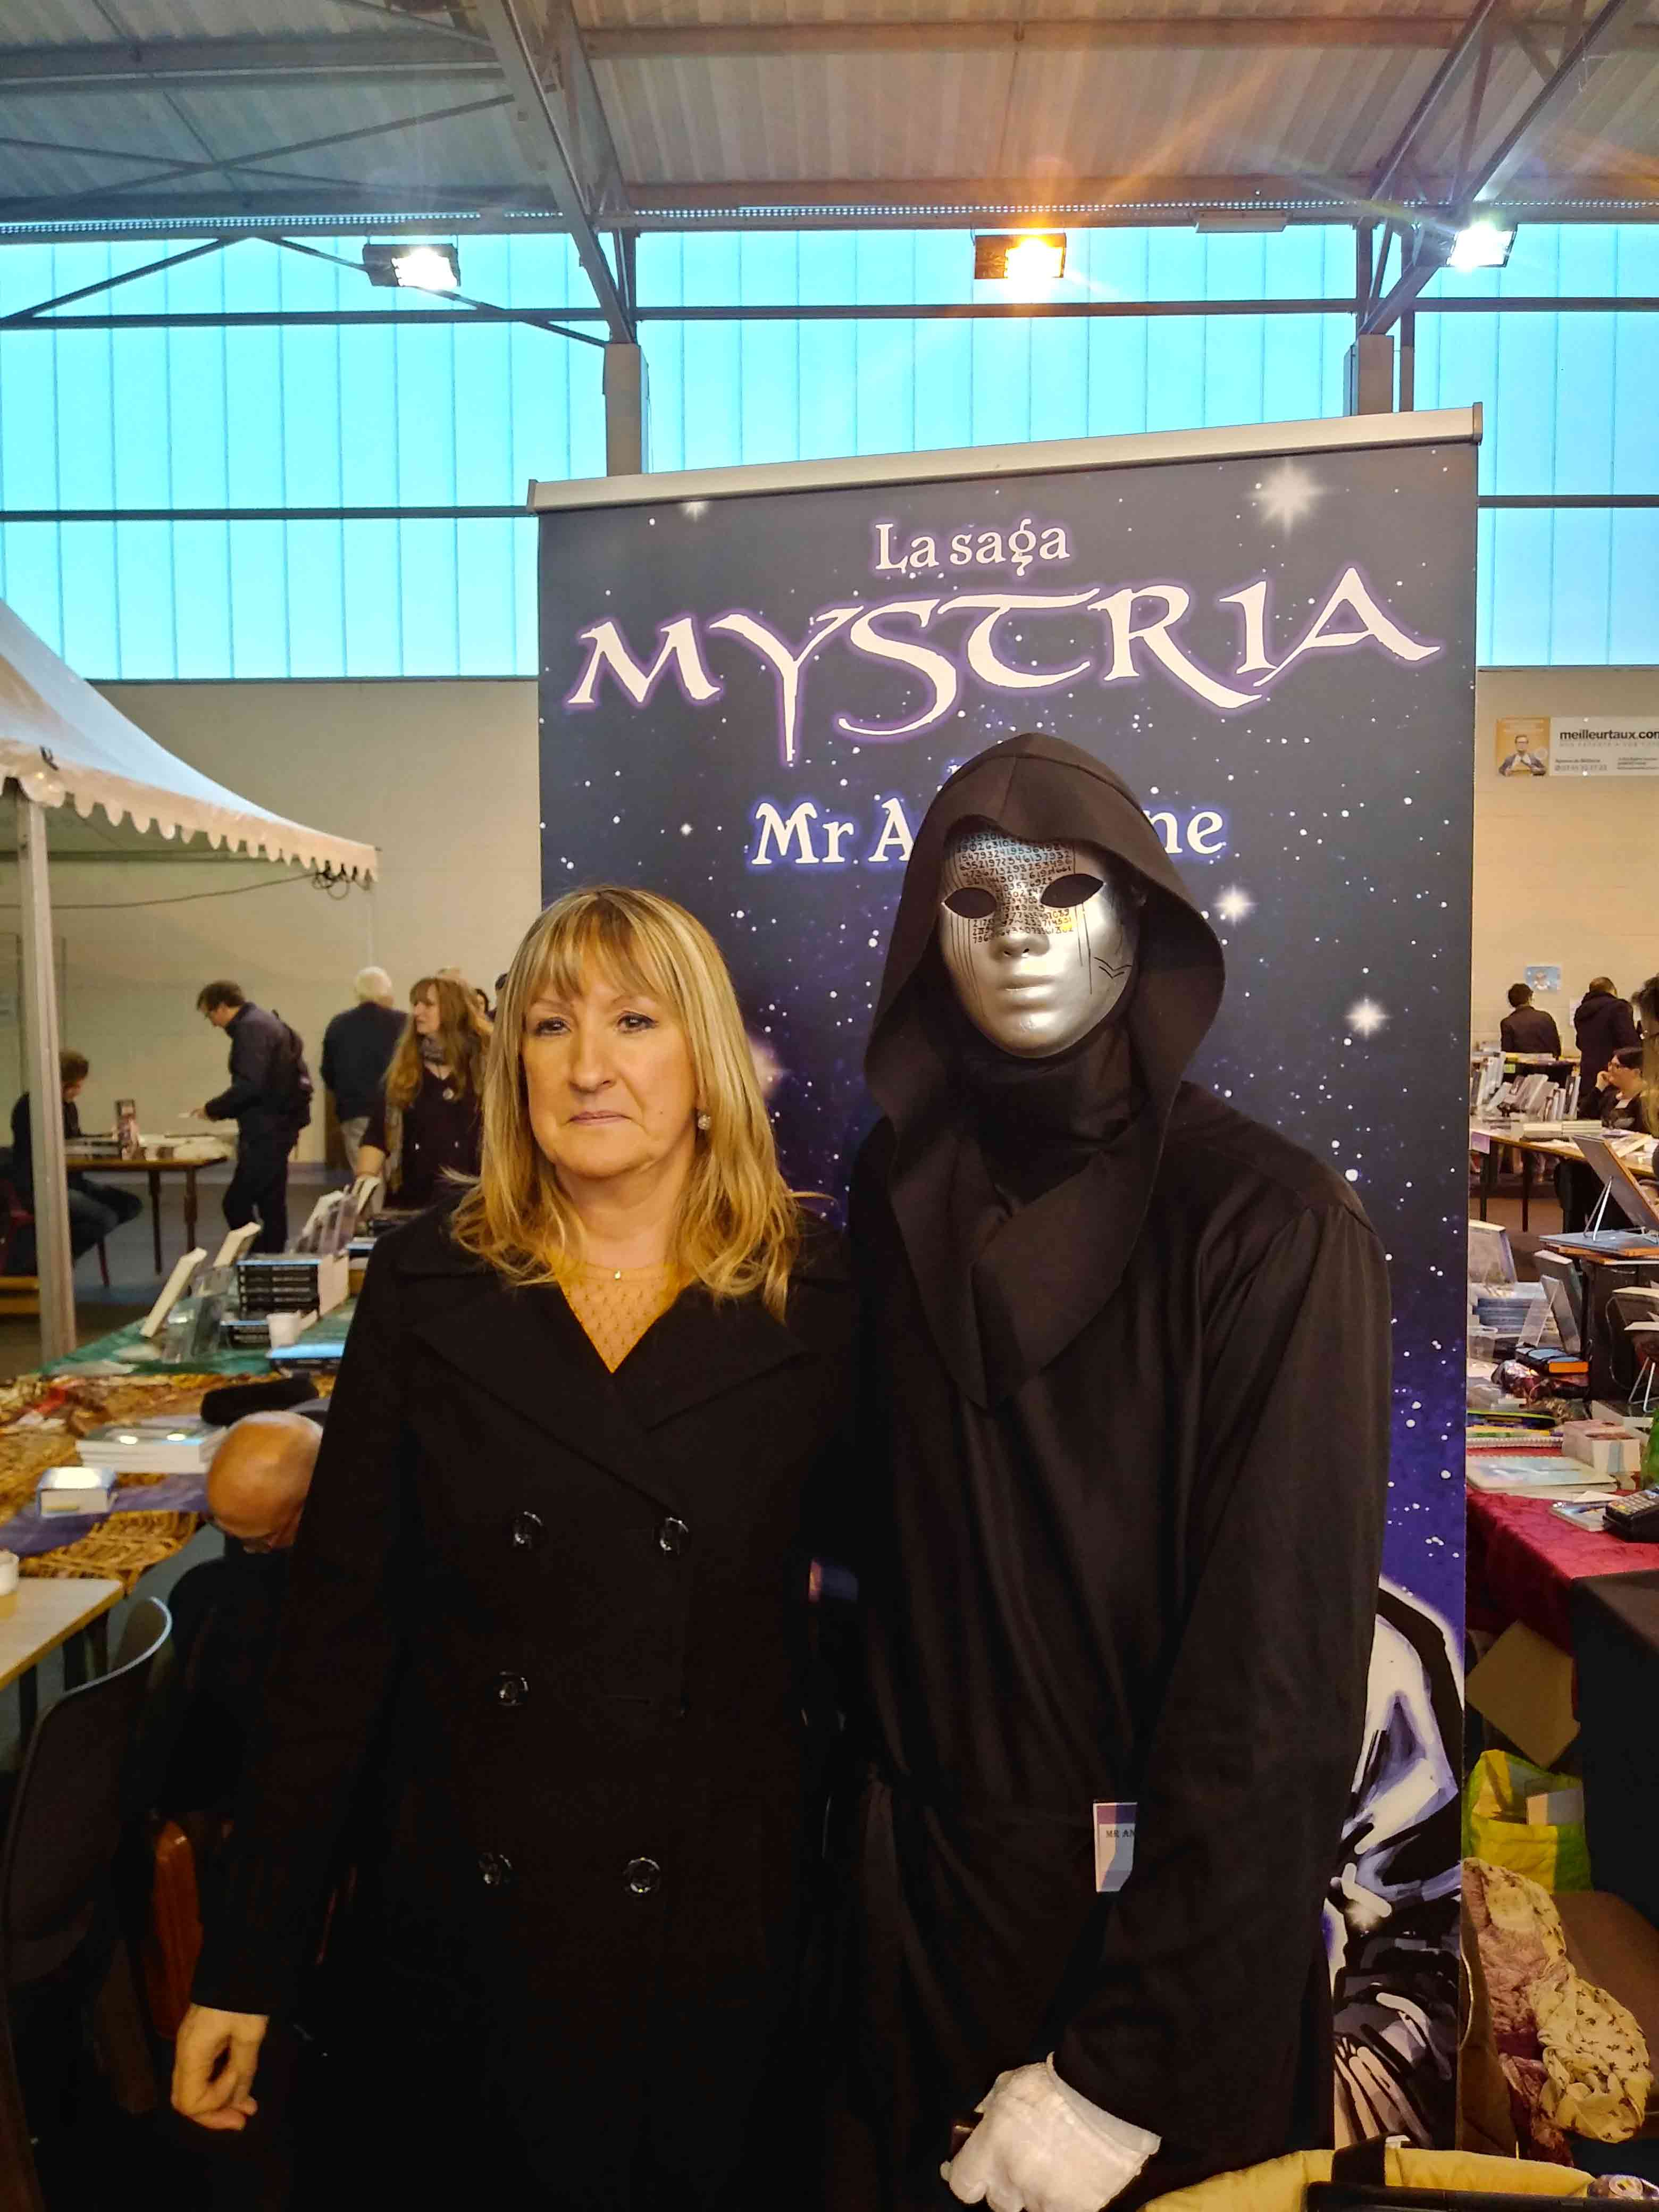 Mystrienne